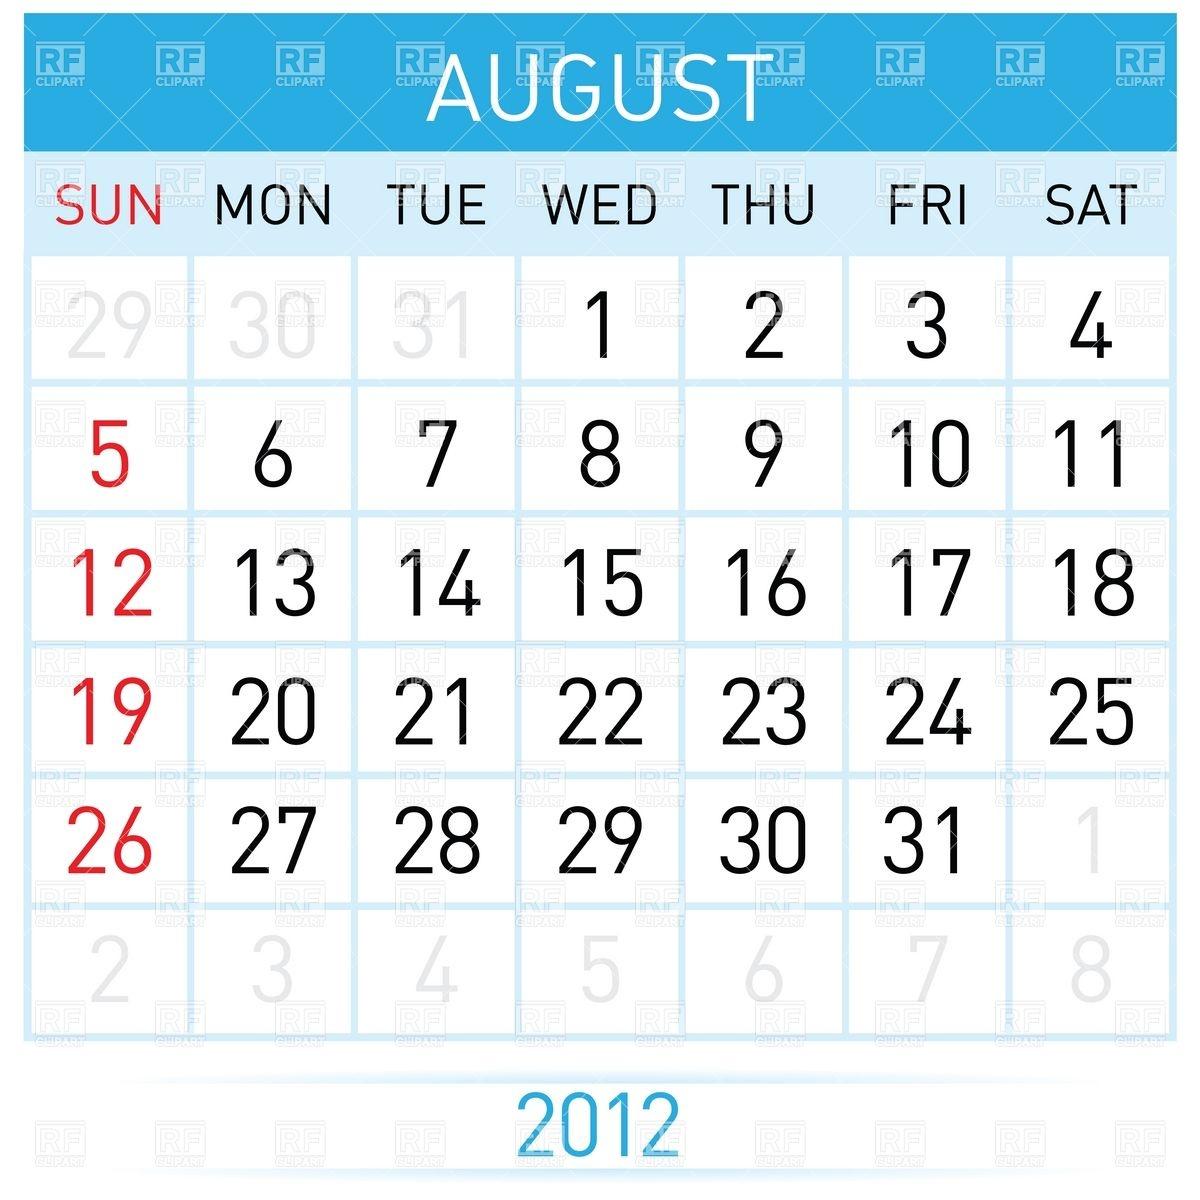 August 2012 calendar clipart vector free stock August 2012 calendar clipart - ClipartFest vector free stock